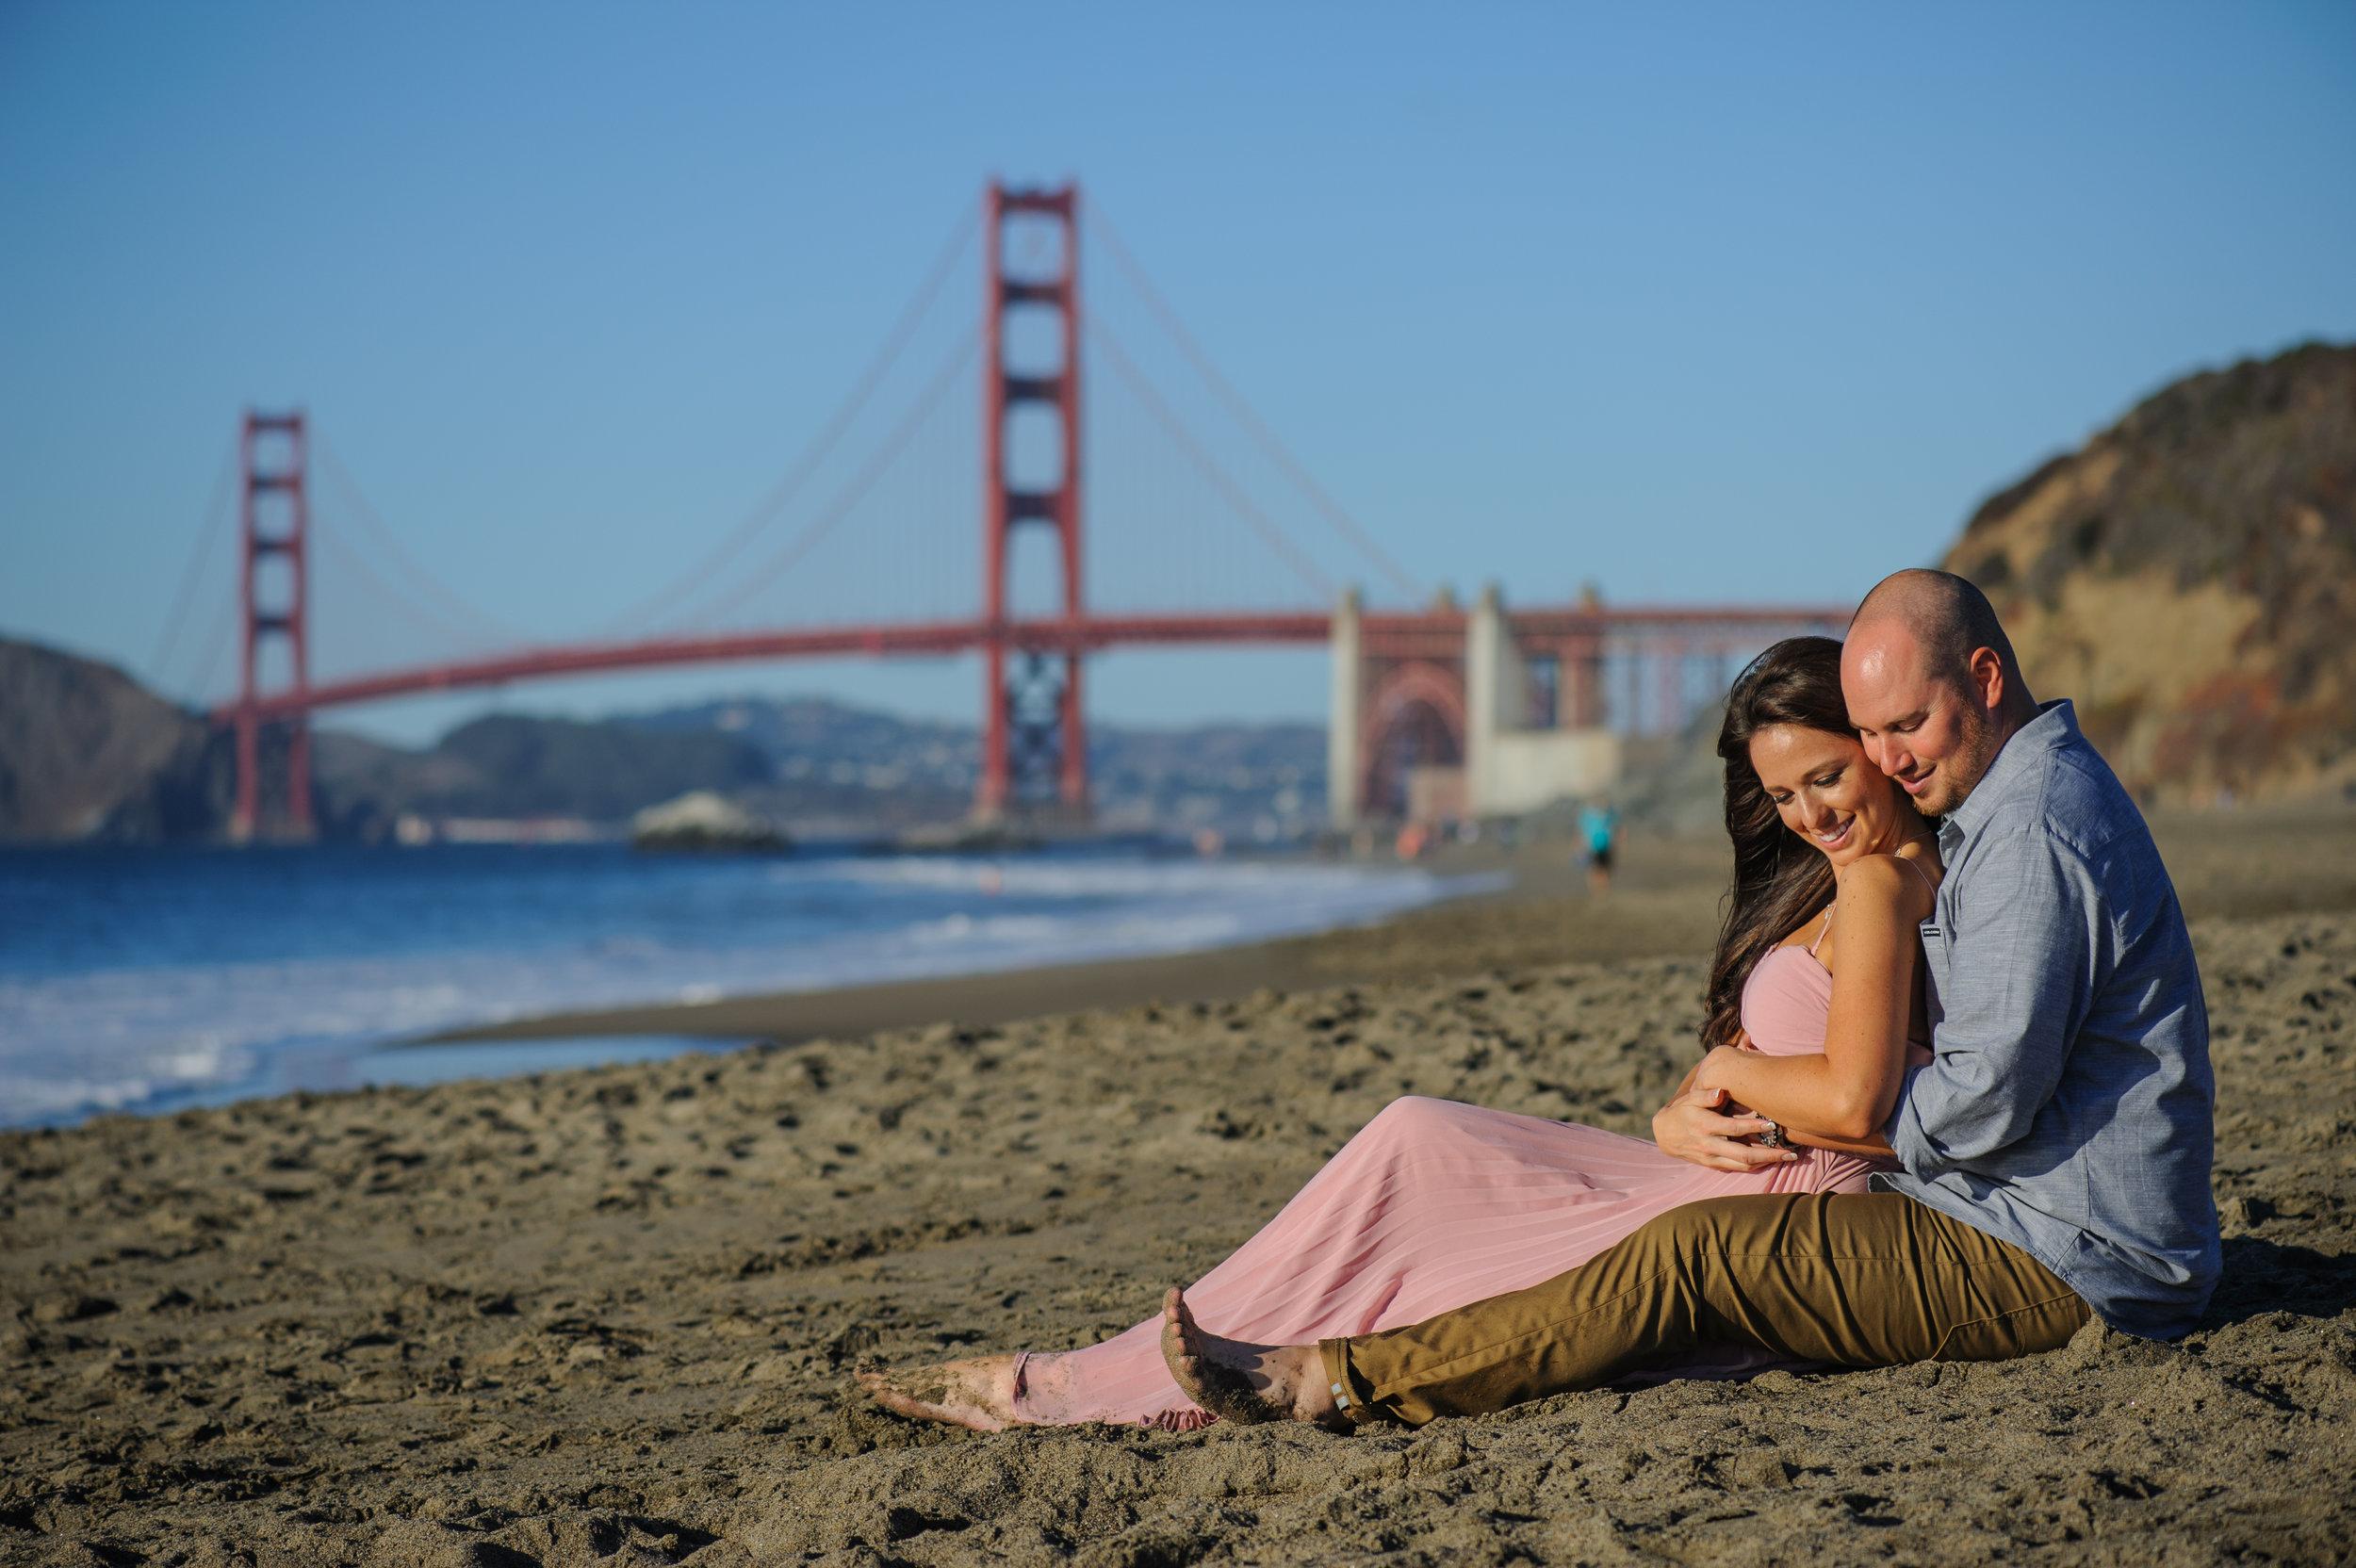 jenny-sean-014-san-francisco-giants-engagement-wedding-photographer-katherine-nicole-photography.JPG